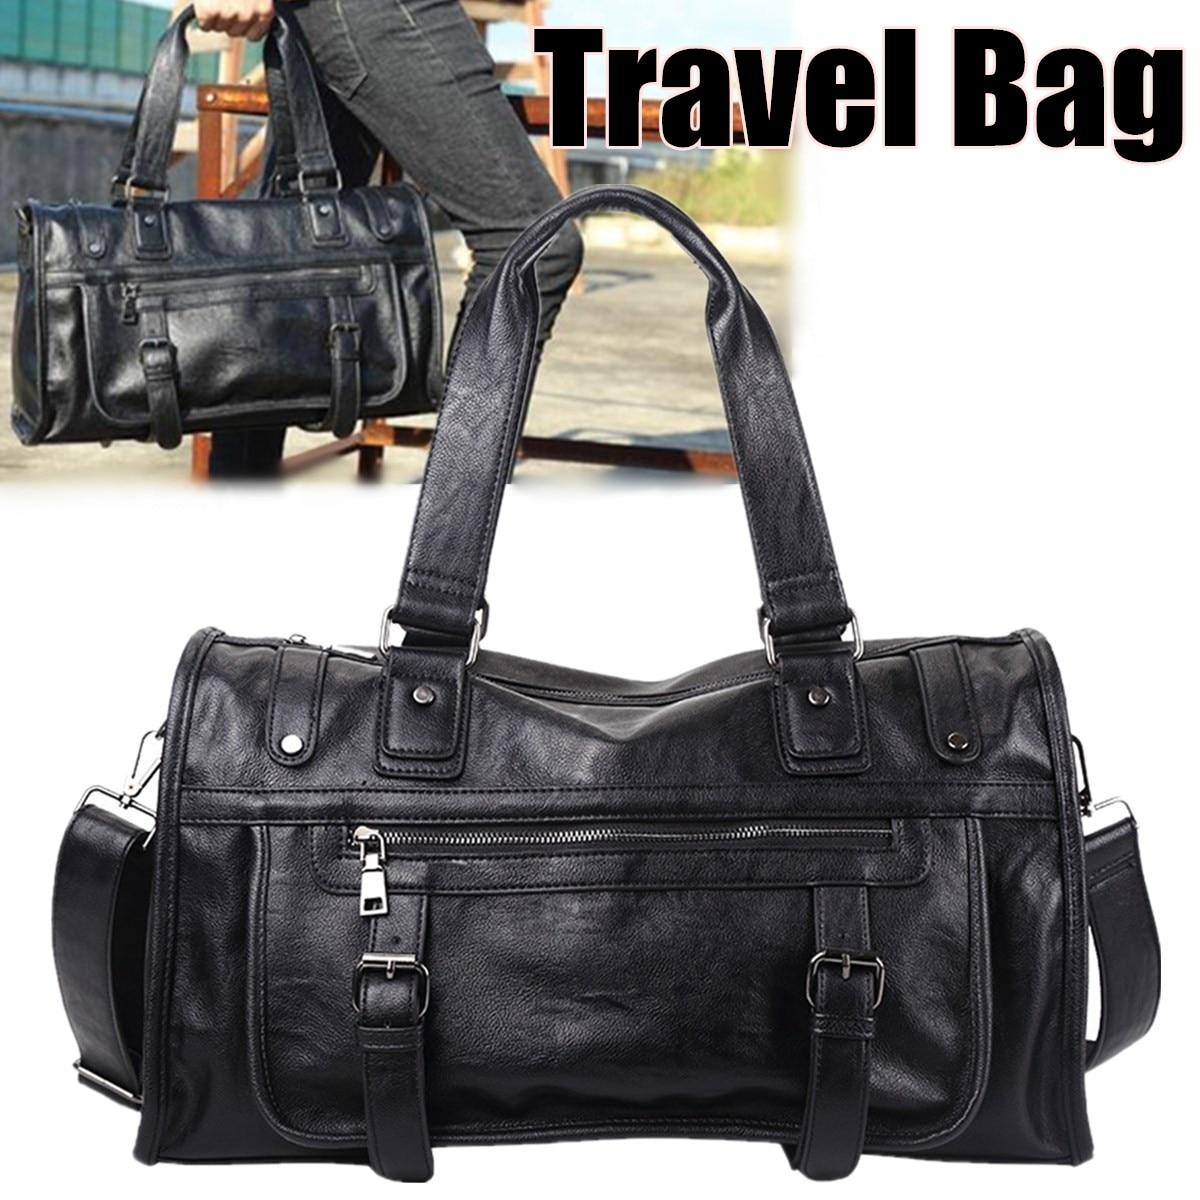 Luxury Brand Casual Travel Duffel Bag PU Leather Men Handbags Big Large Capacity Travel Bags Black Mens Messenger Bag Tote Black